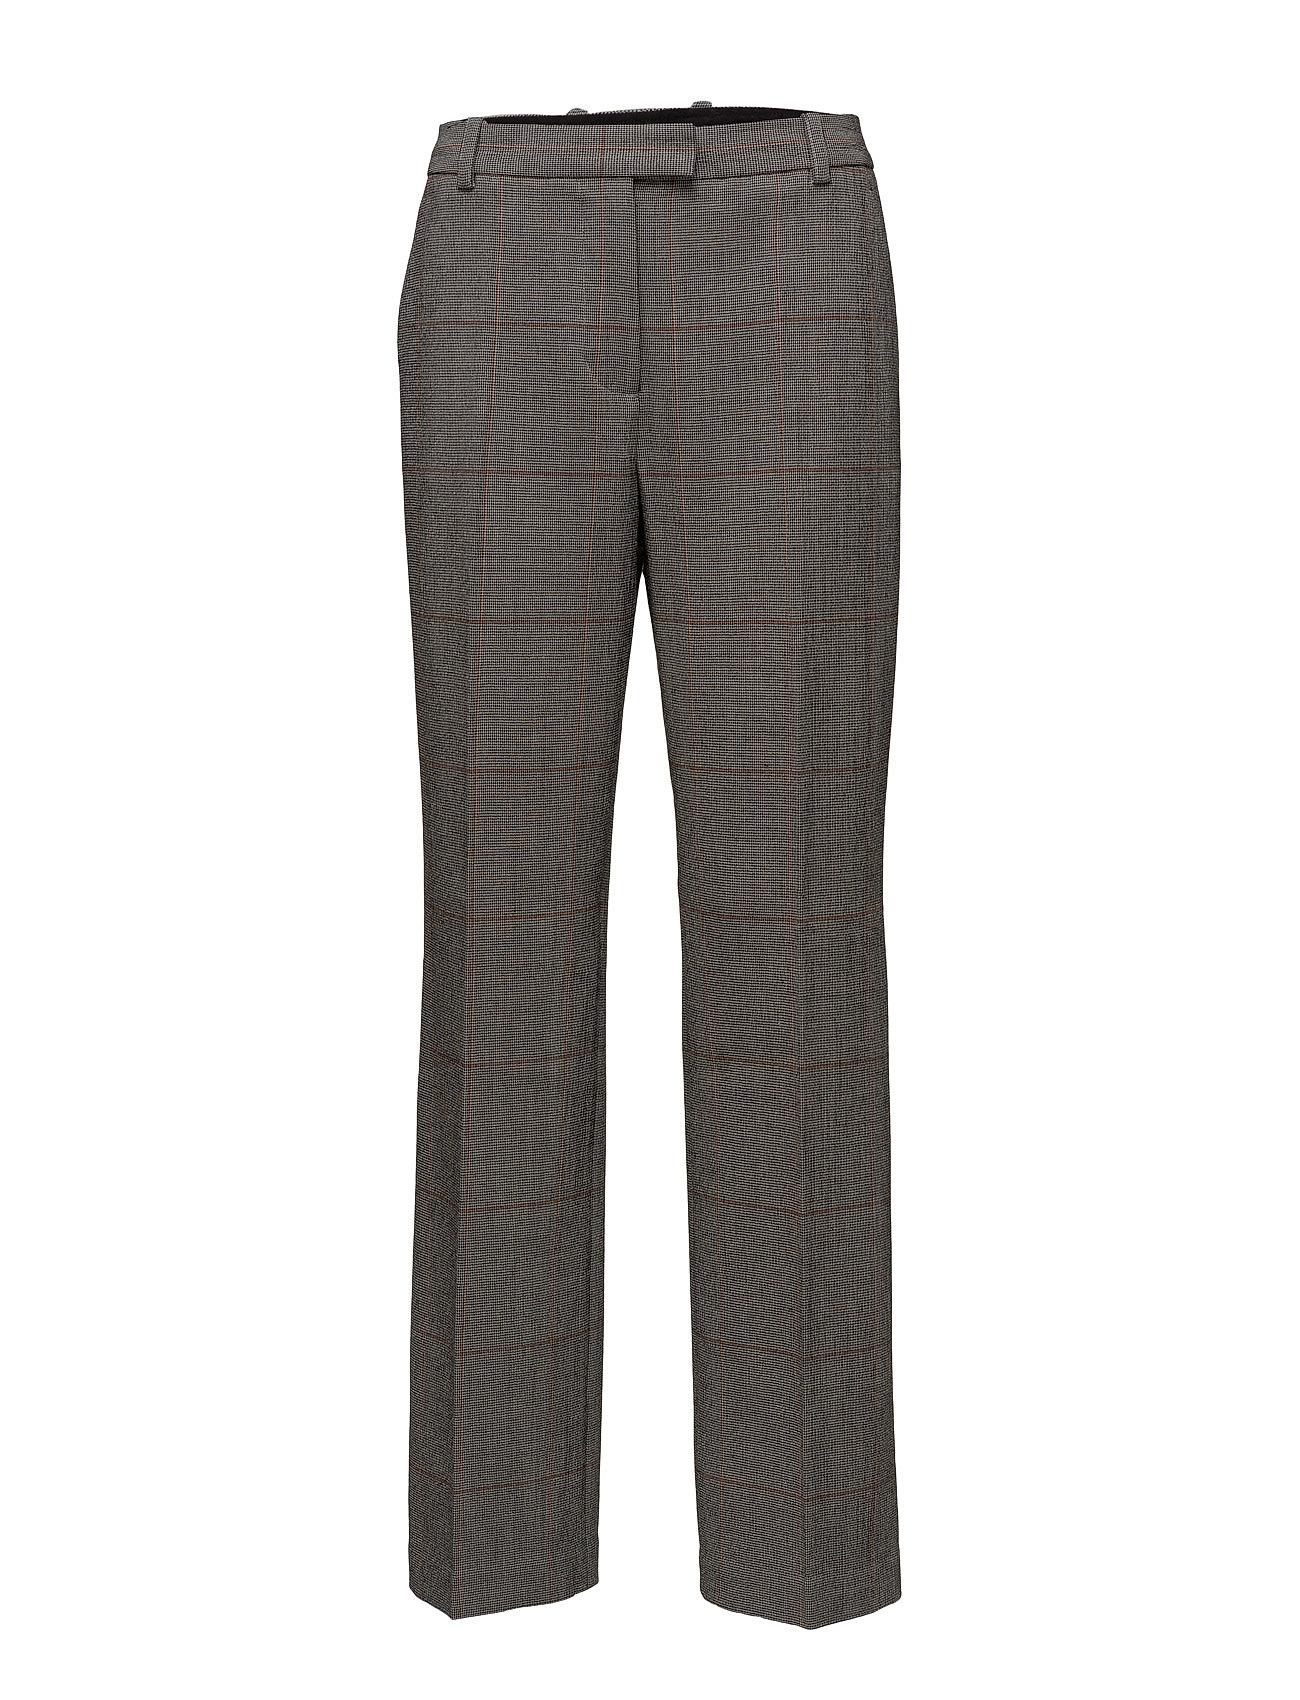 Image of Long Stovepipe Pant Bukser Med Lige Ben Grå 3.1 PHILLIP LIM (3038172169)